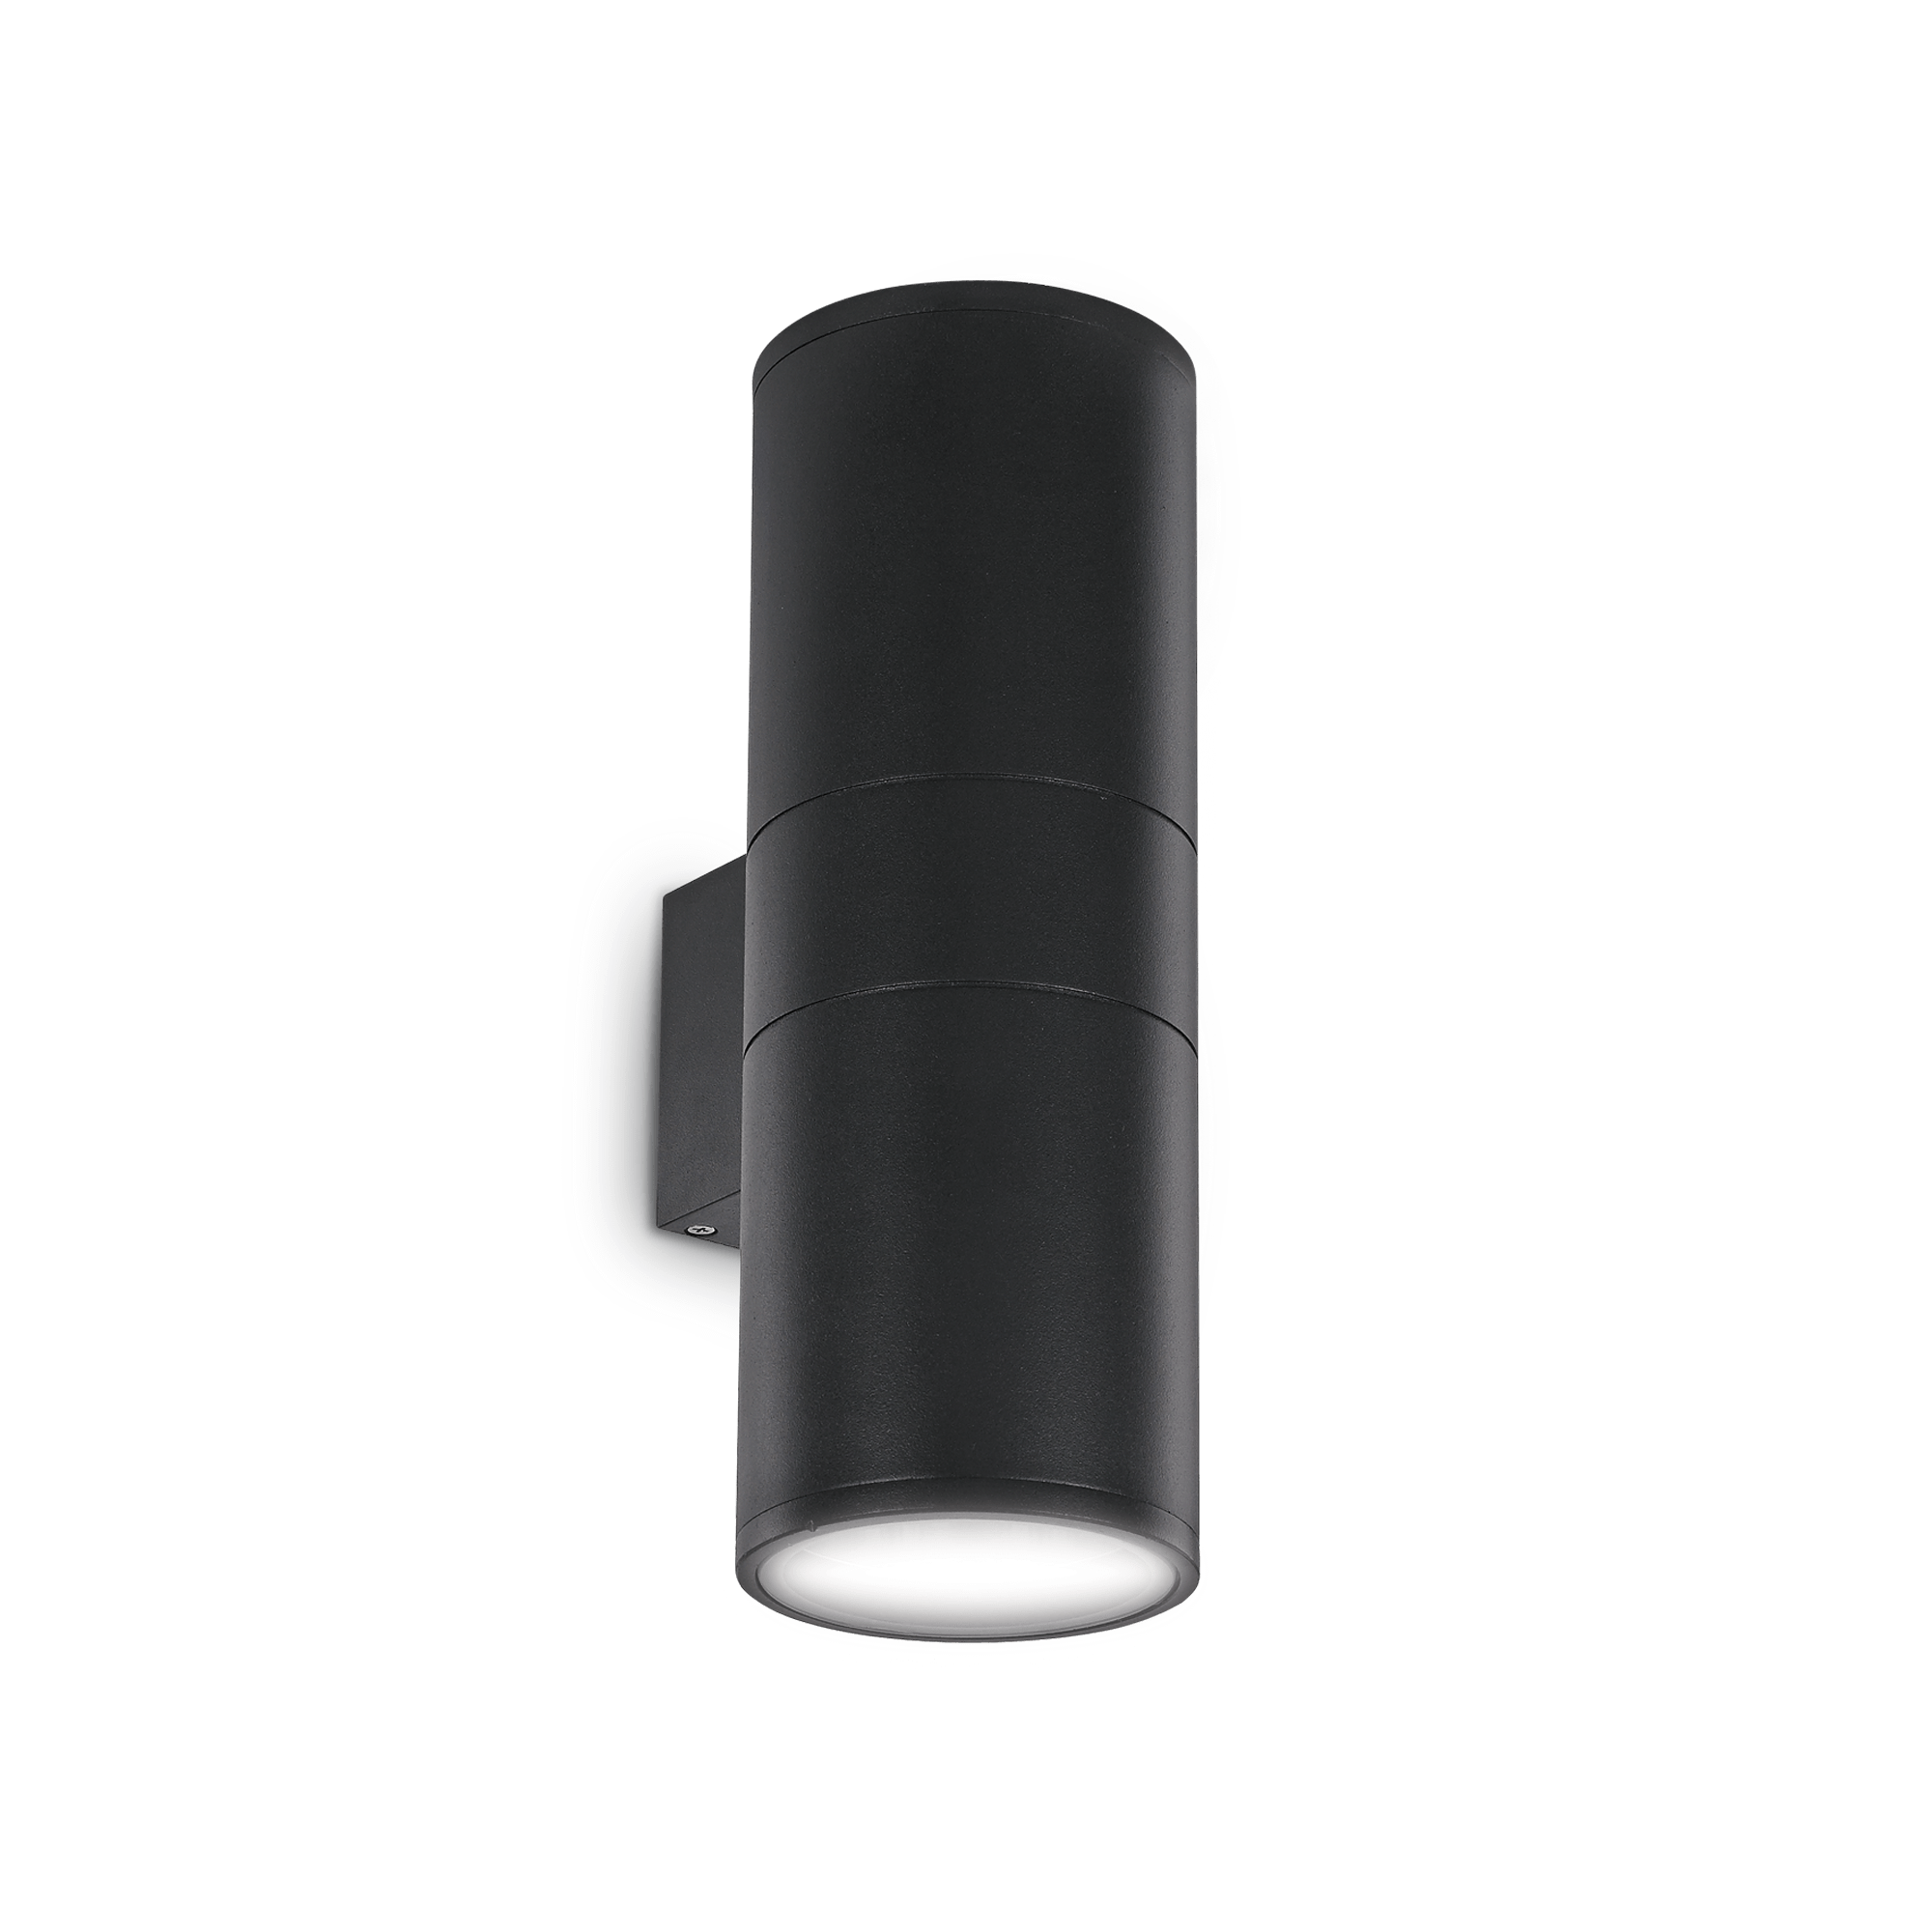 Ideal Lux 092317 Gun AP2 Big Nero kültéri falilámpa